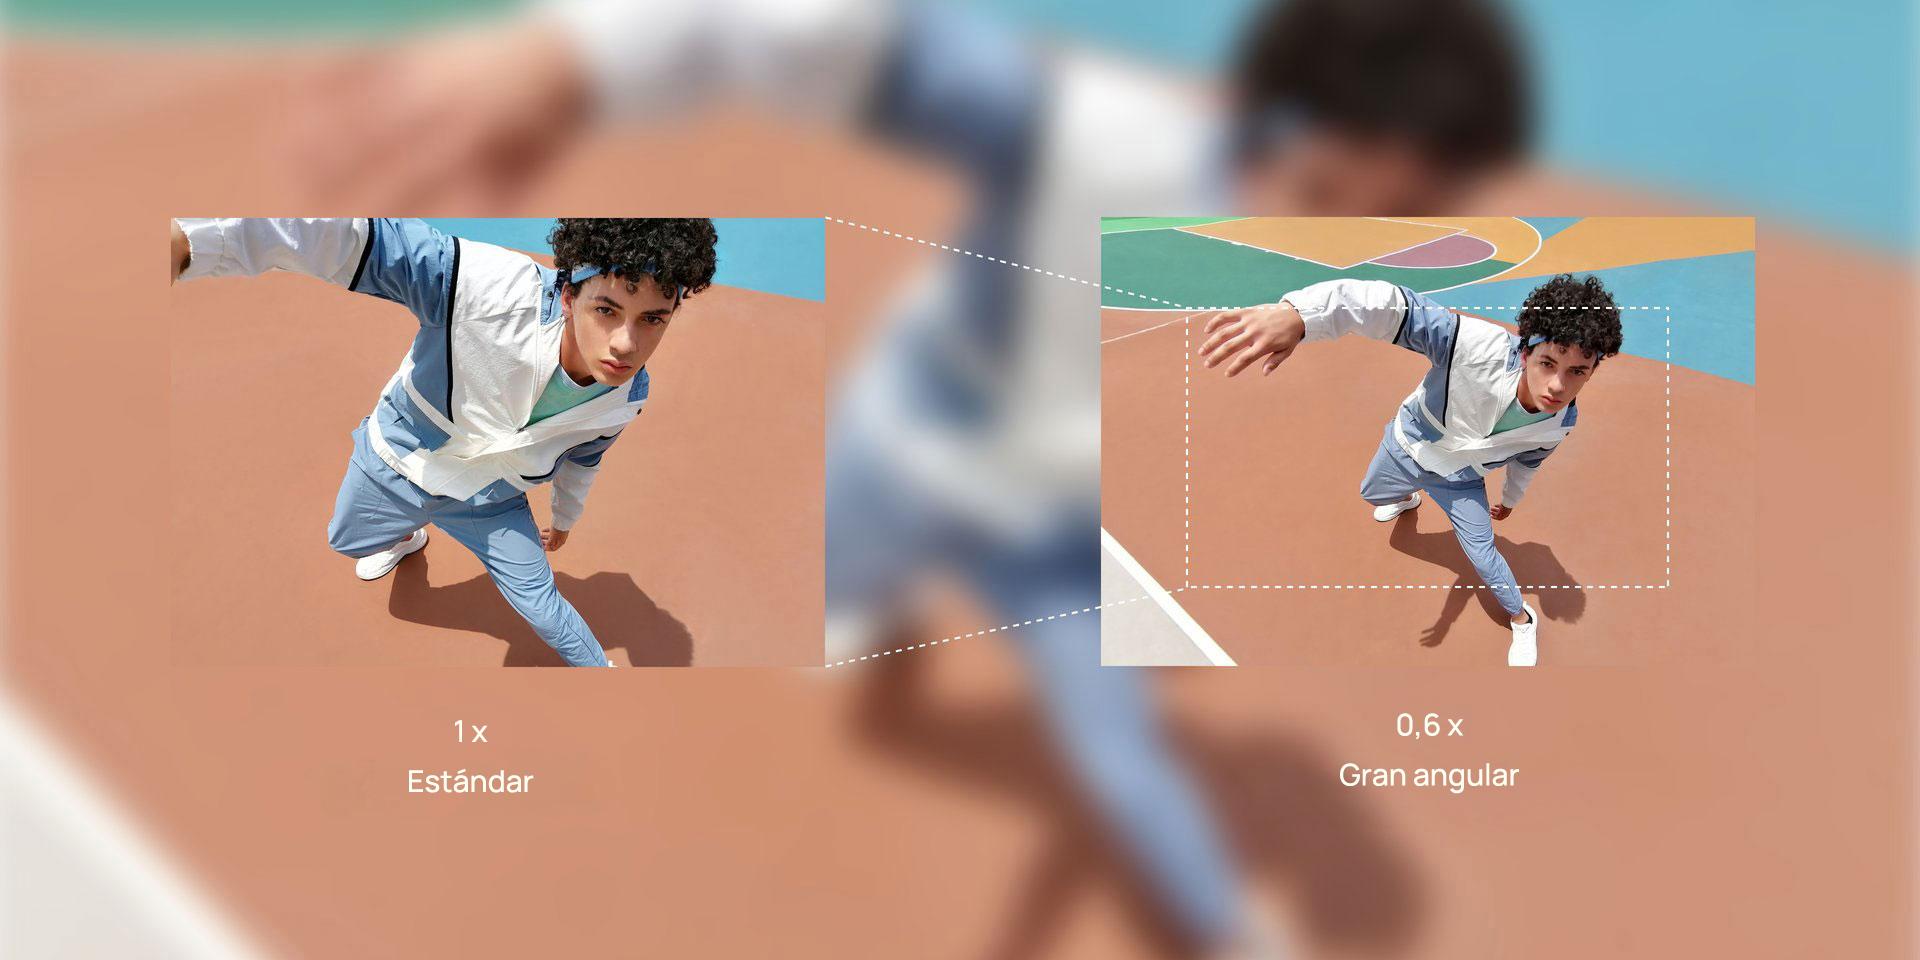 HUAWEI P smart 2021 Ultra Wide Angle Lens